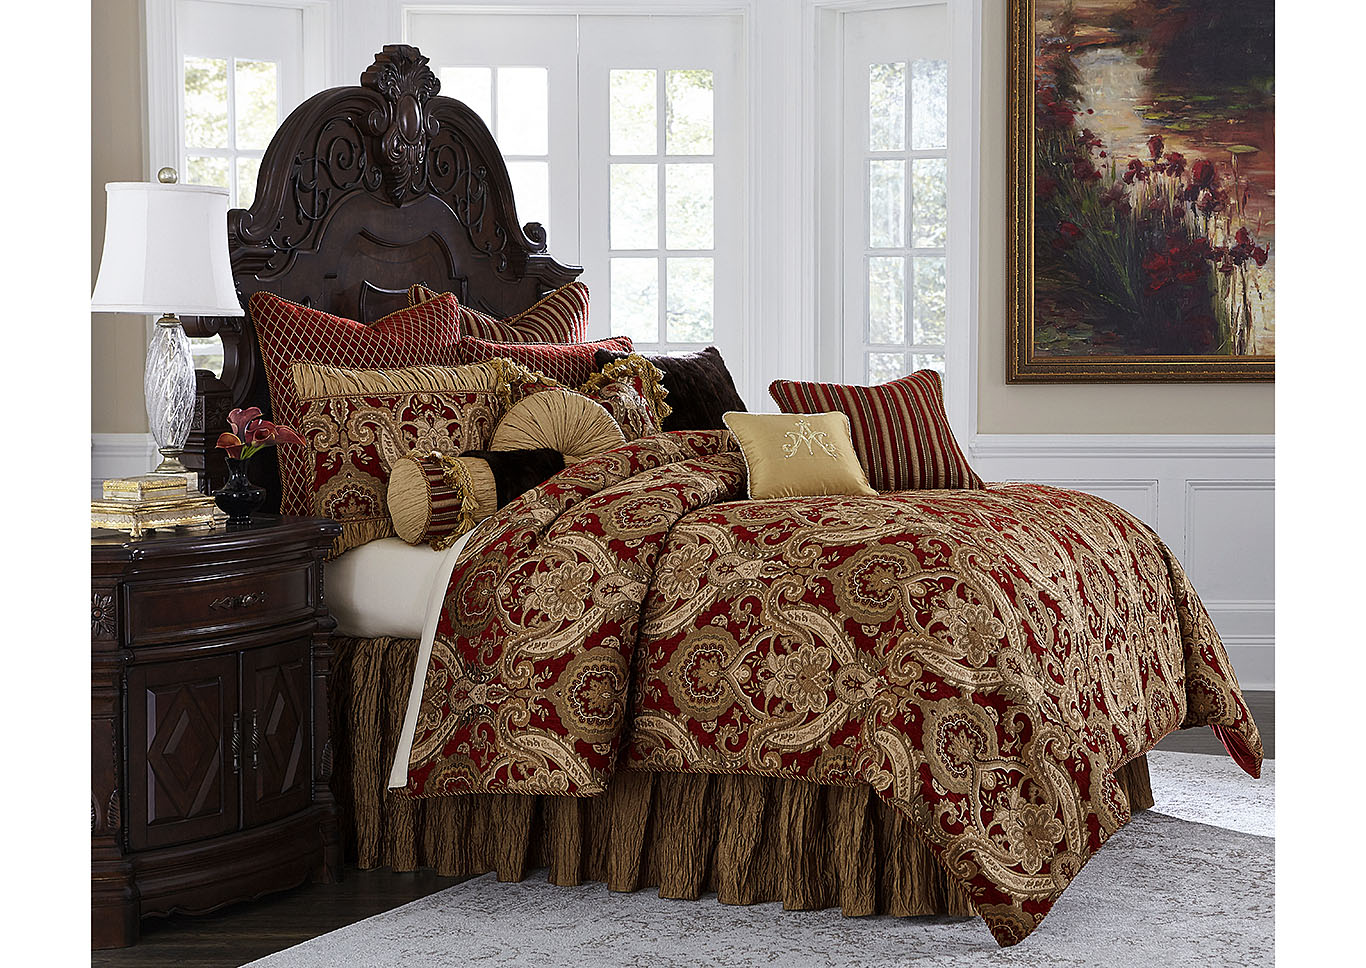 Lafayette Red Gold 12 Pc Queen Comforter Set El Encanto Furniture By Yulissa